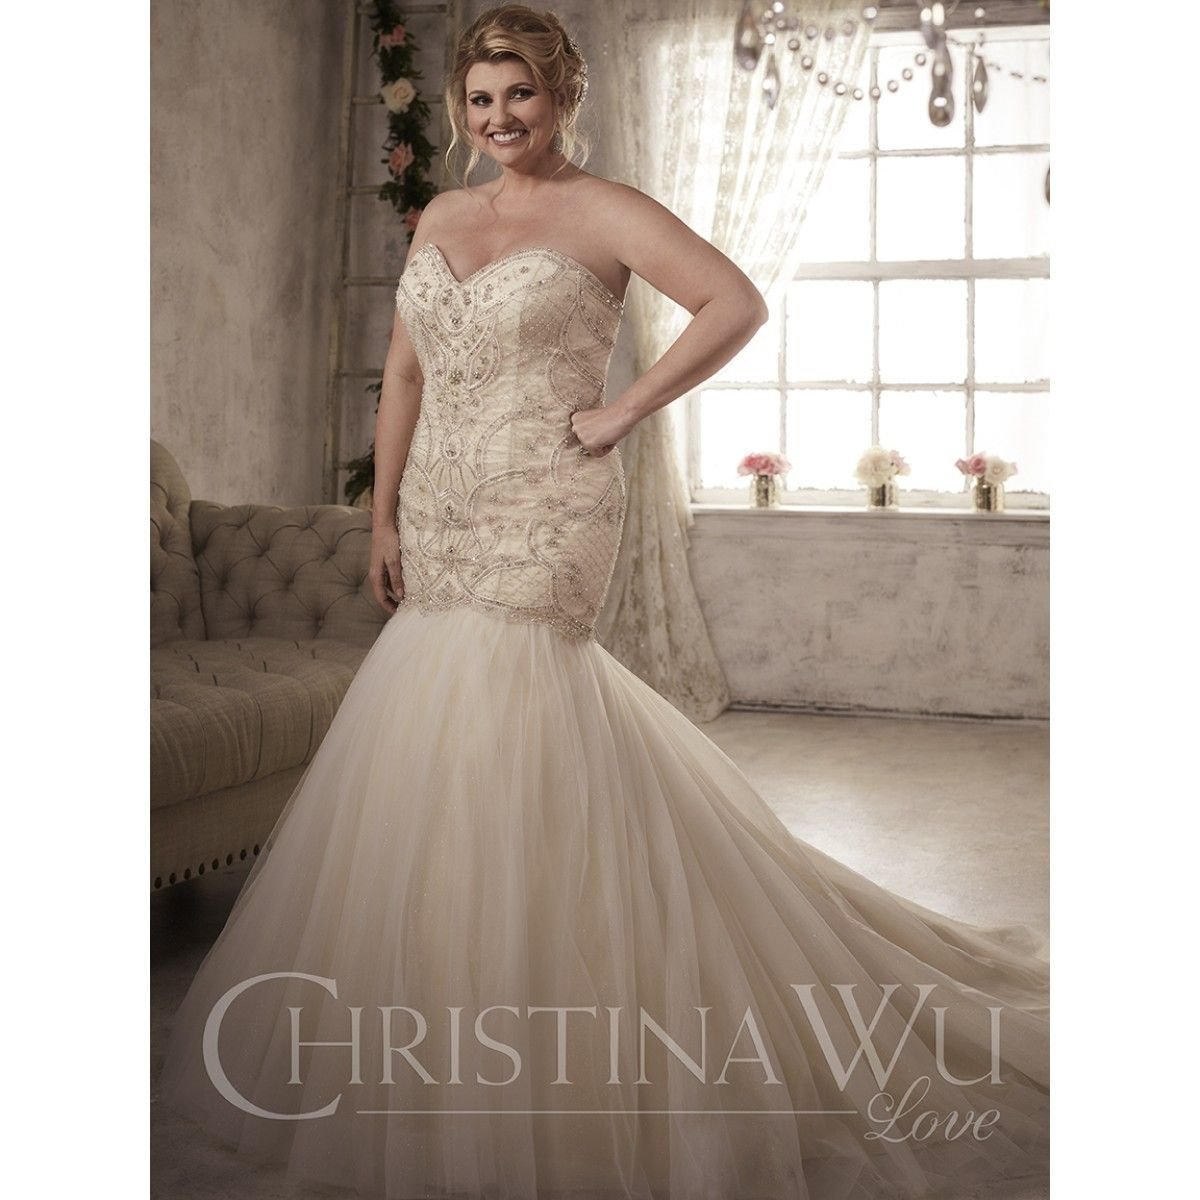 Christina wu wedding dresses  Find at Evaus Bridal Center evasbridalcenter  House of